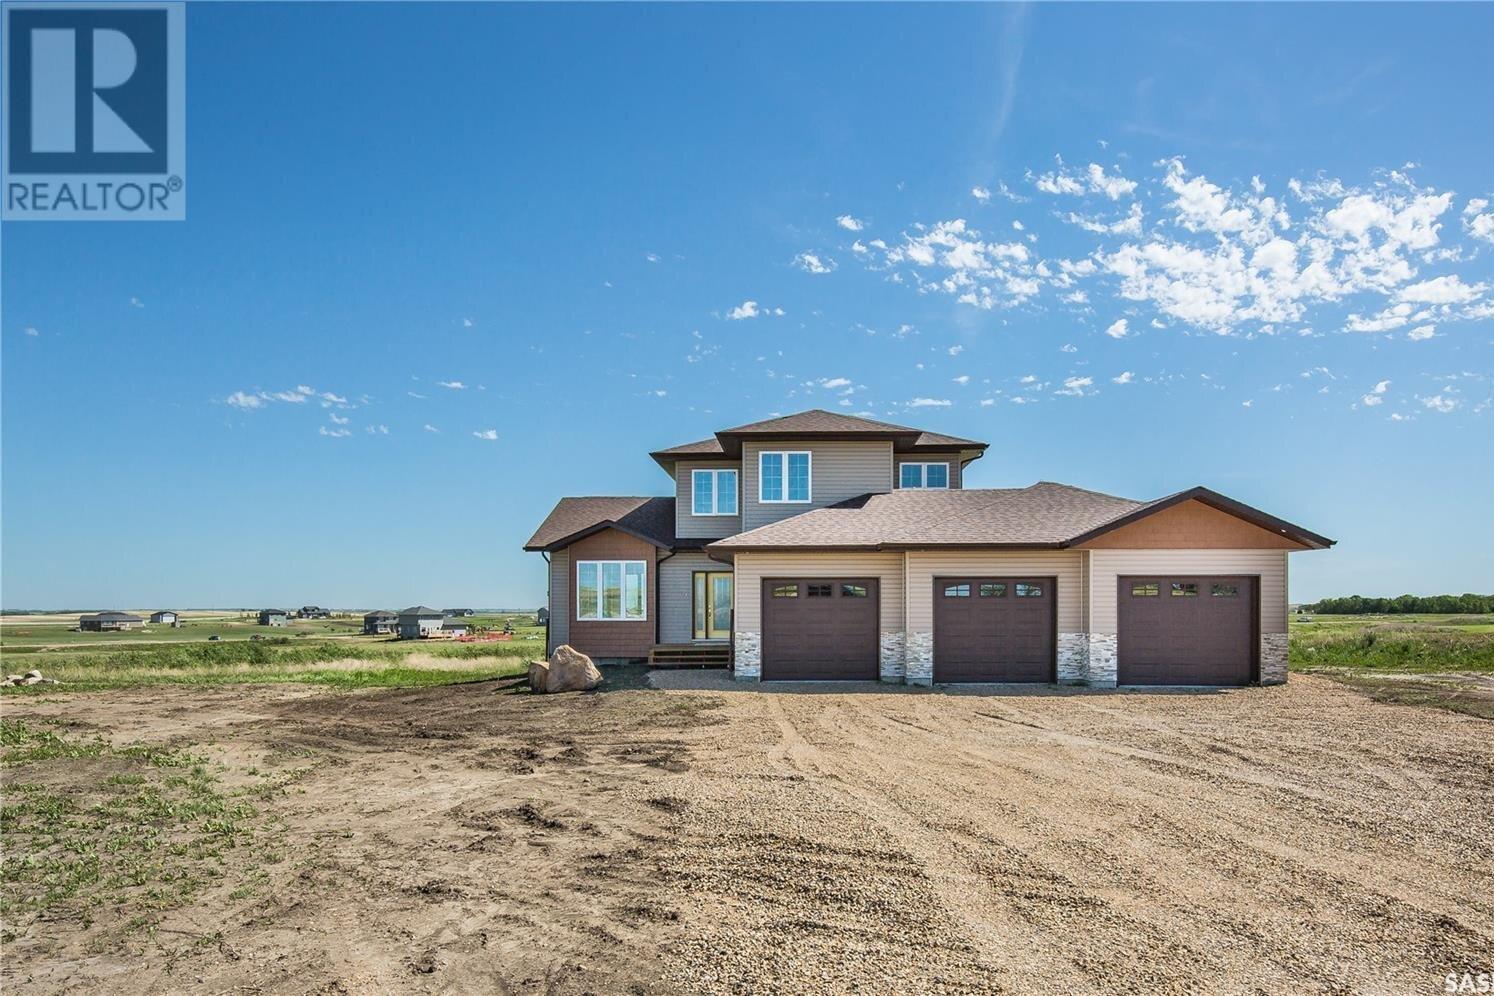 House for sale at 58 Meadowlark Cres Blucher Rm No. 343 Saskatchewan - MLS: SK829009